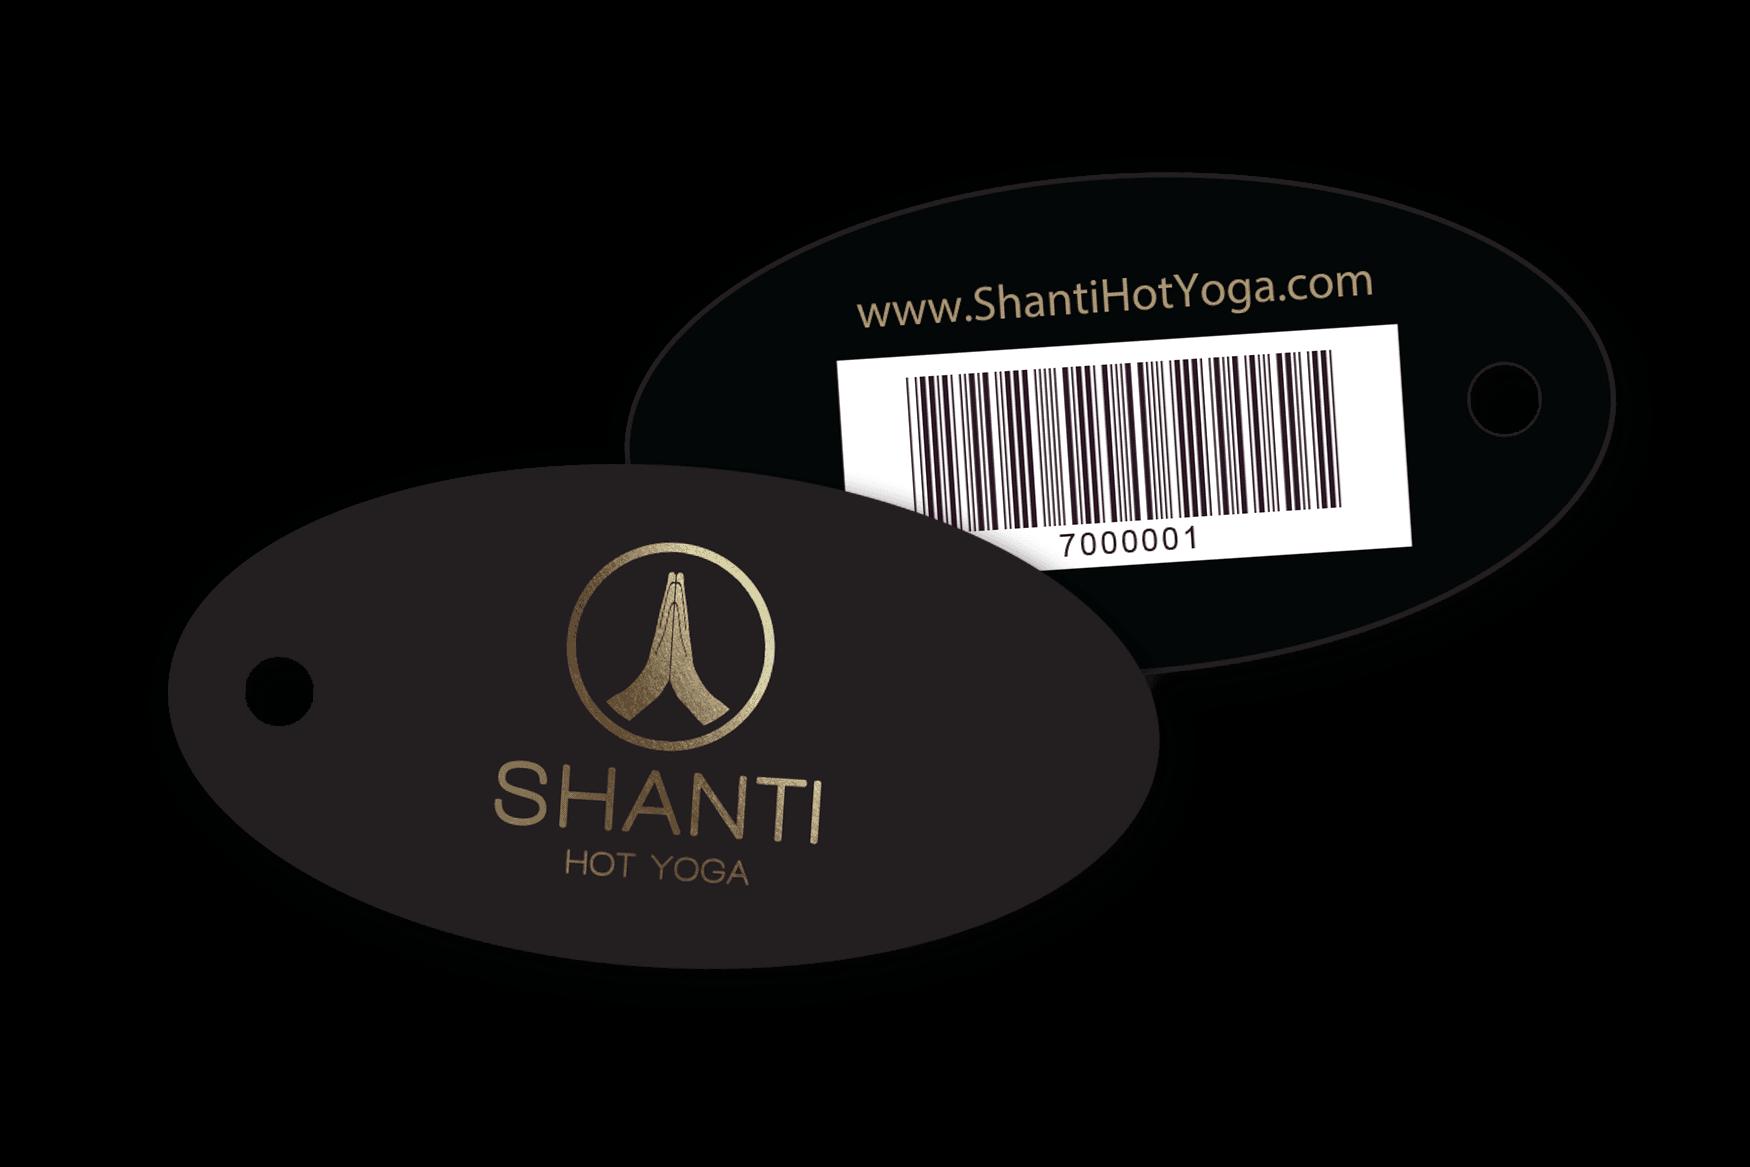 Shanti Hot Yoga Membership Key Tags with Barcode